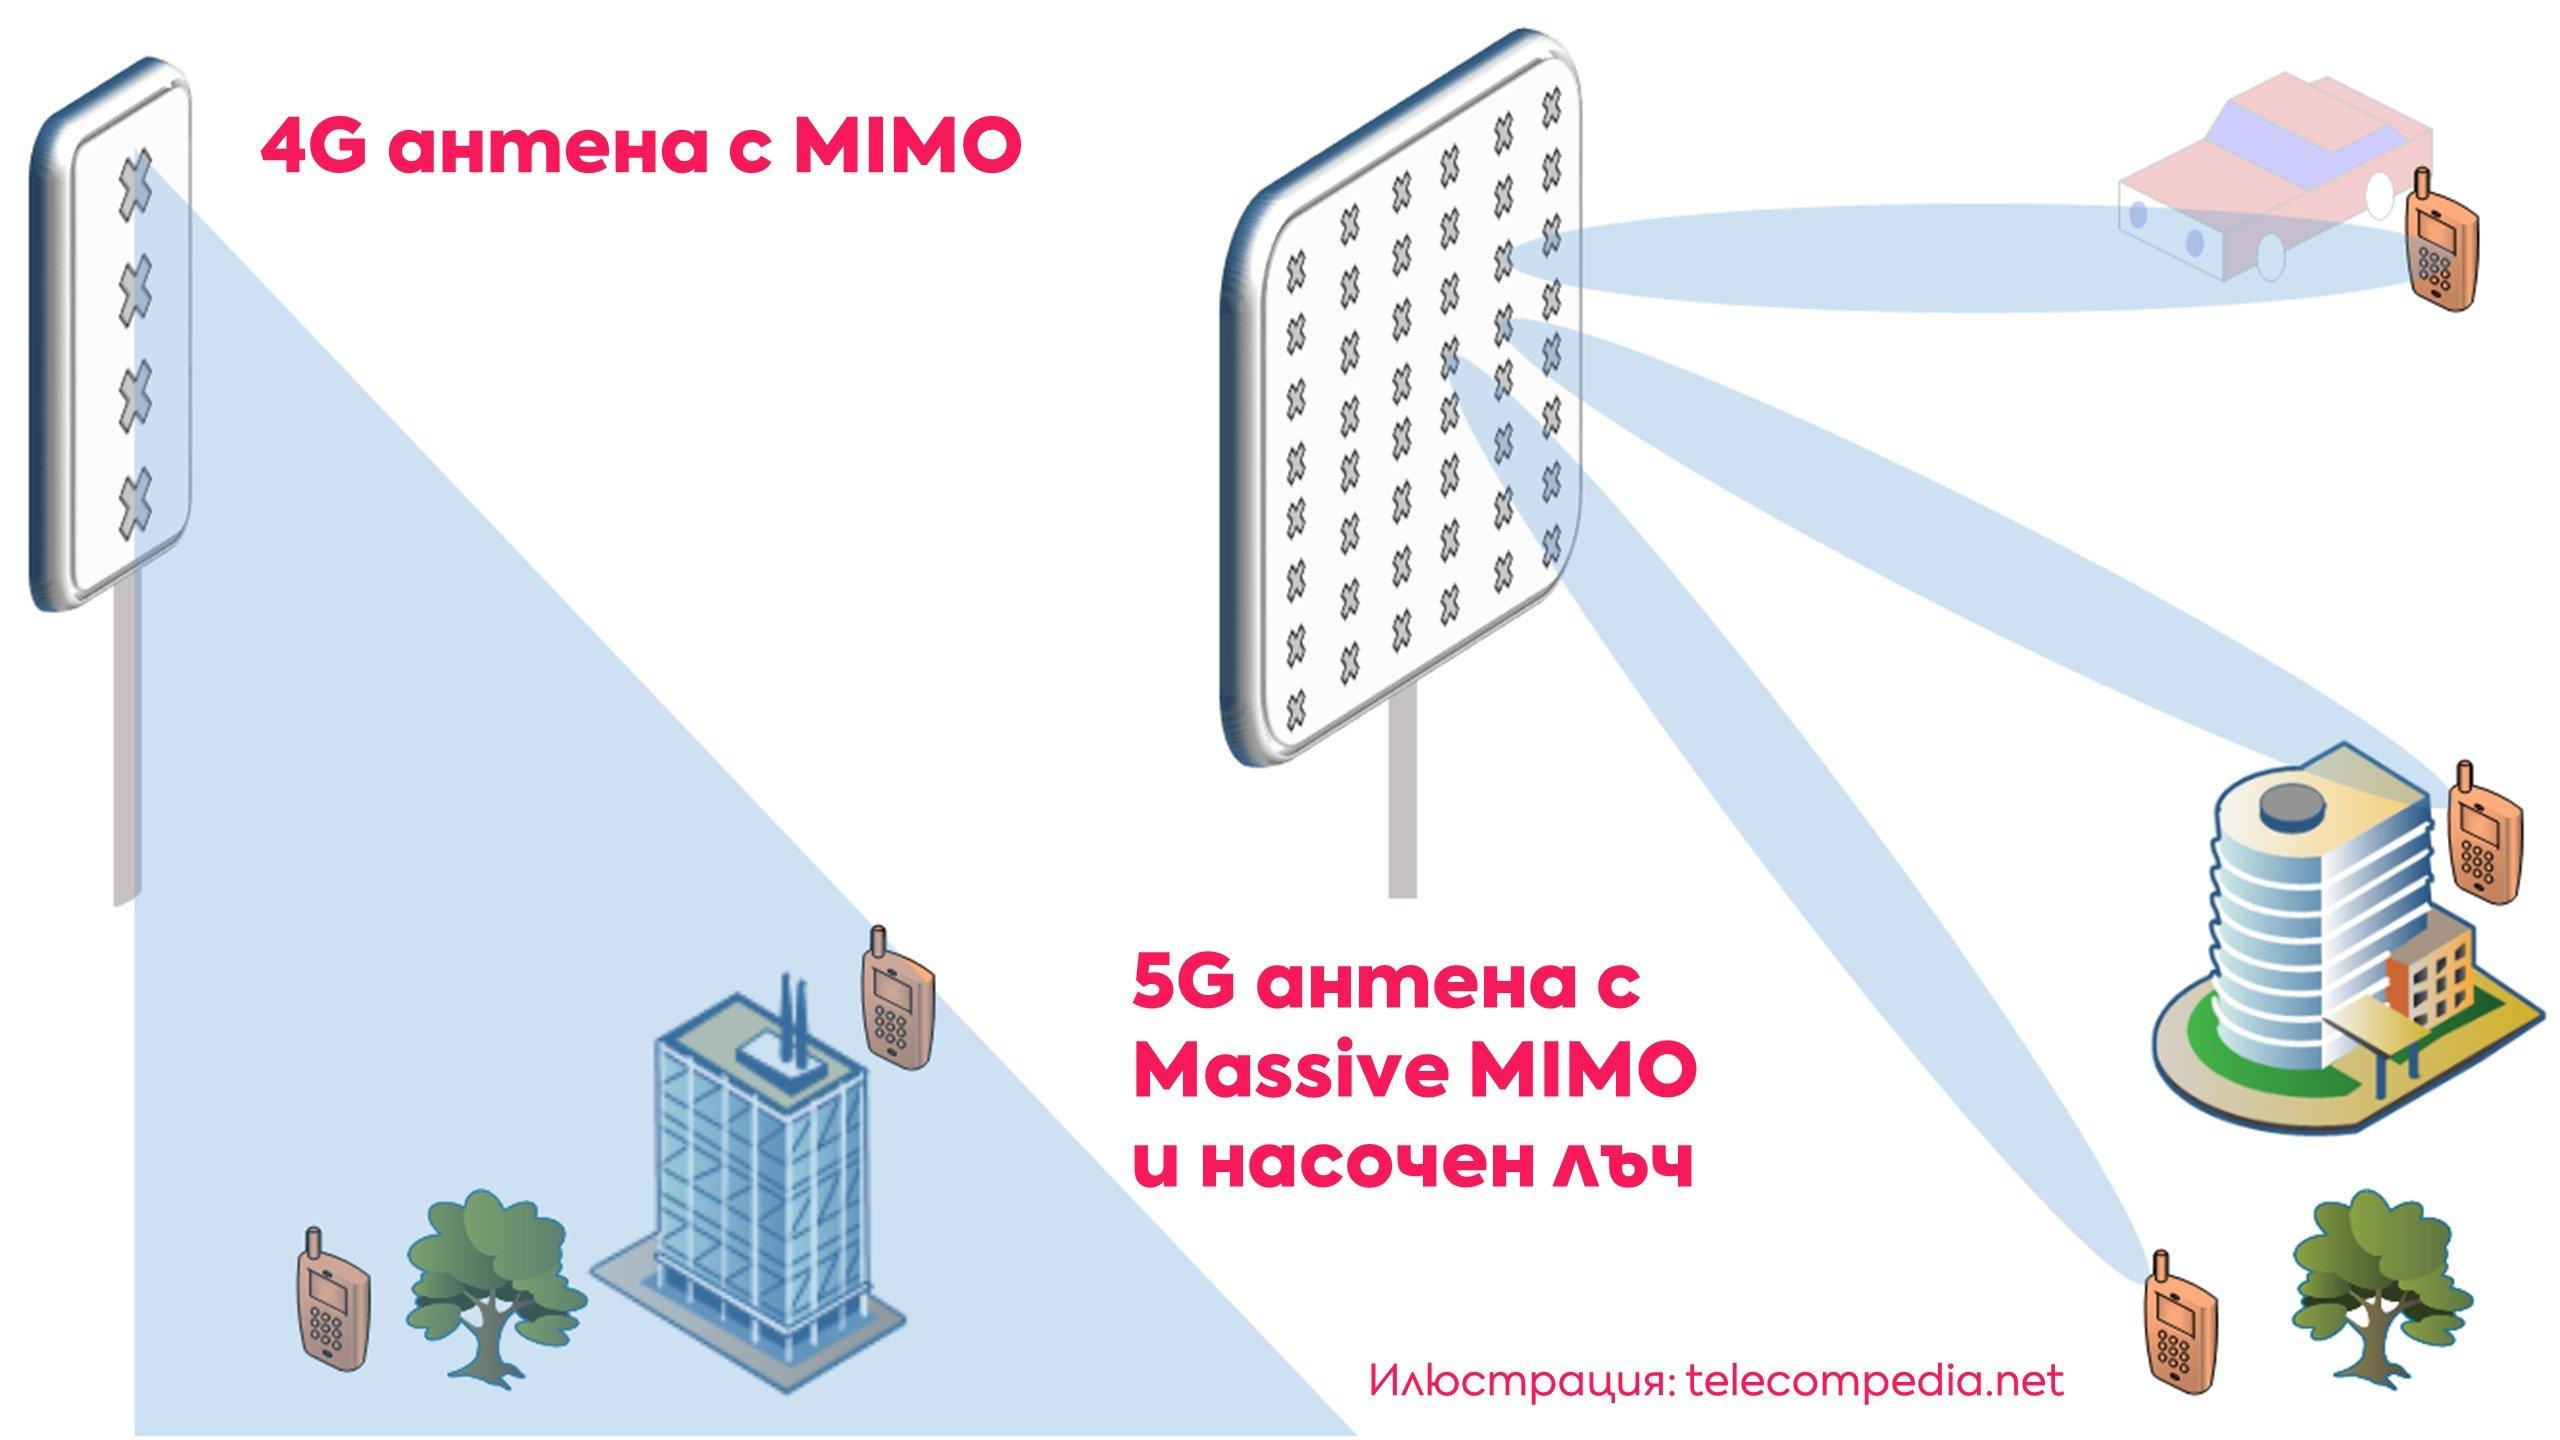 Massive-mimo-beamforming-infographic